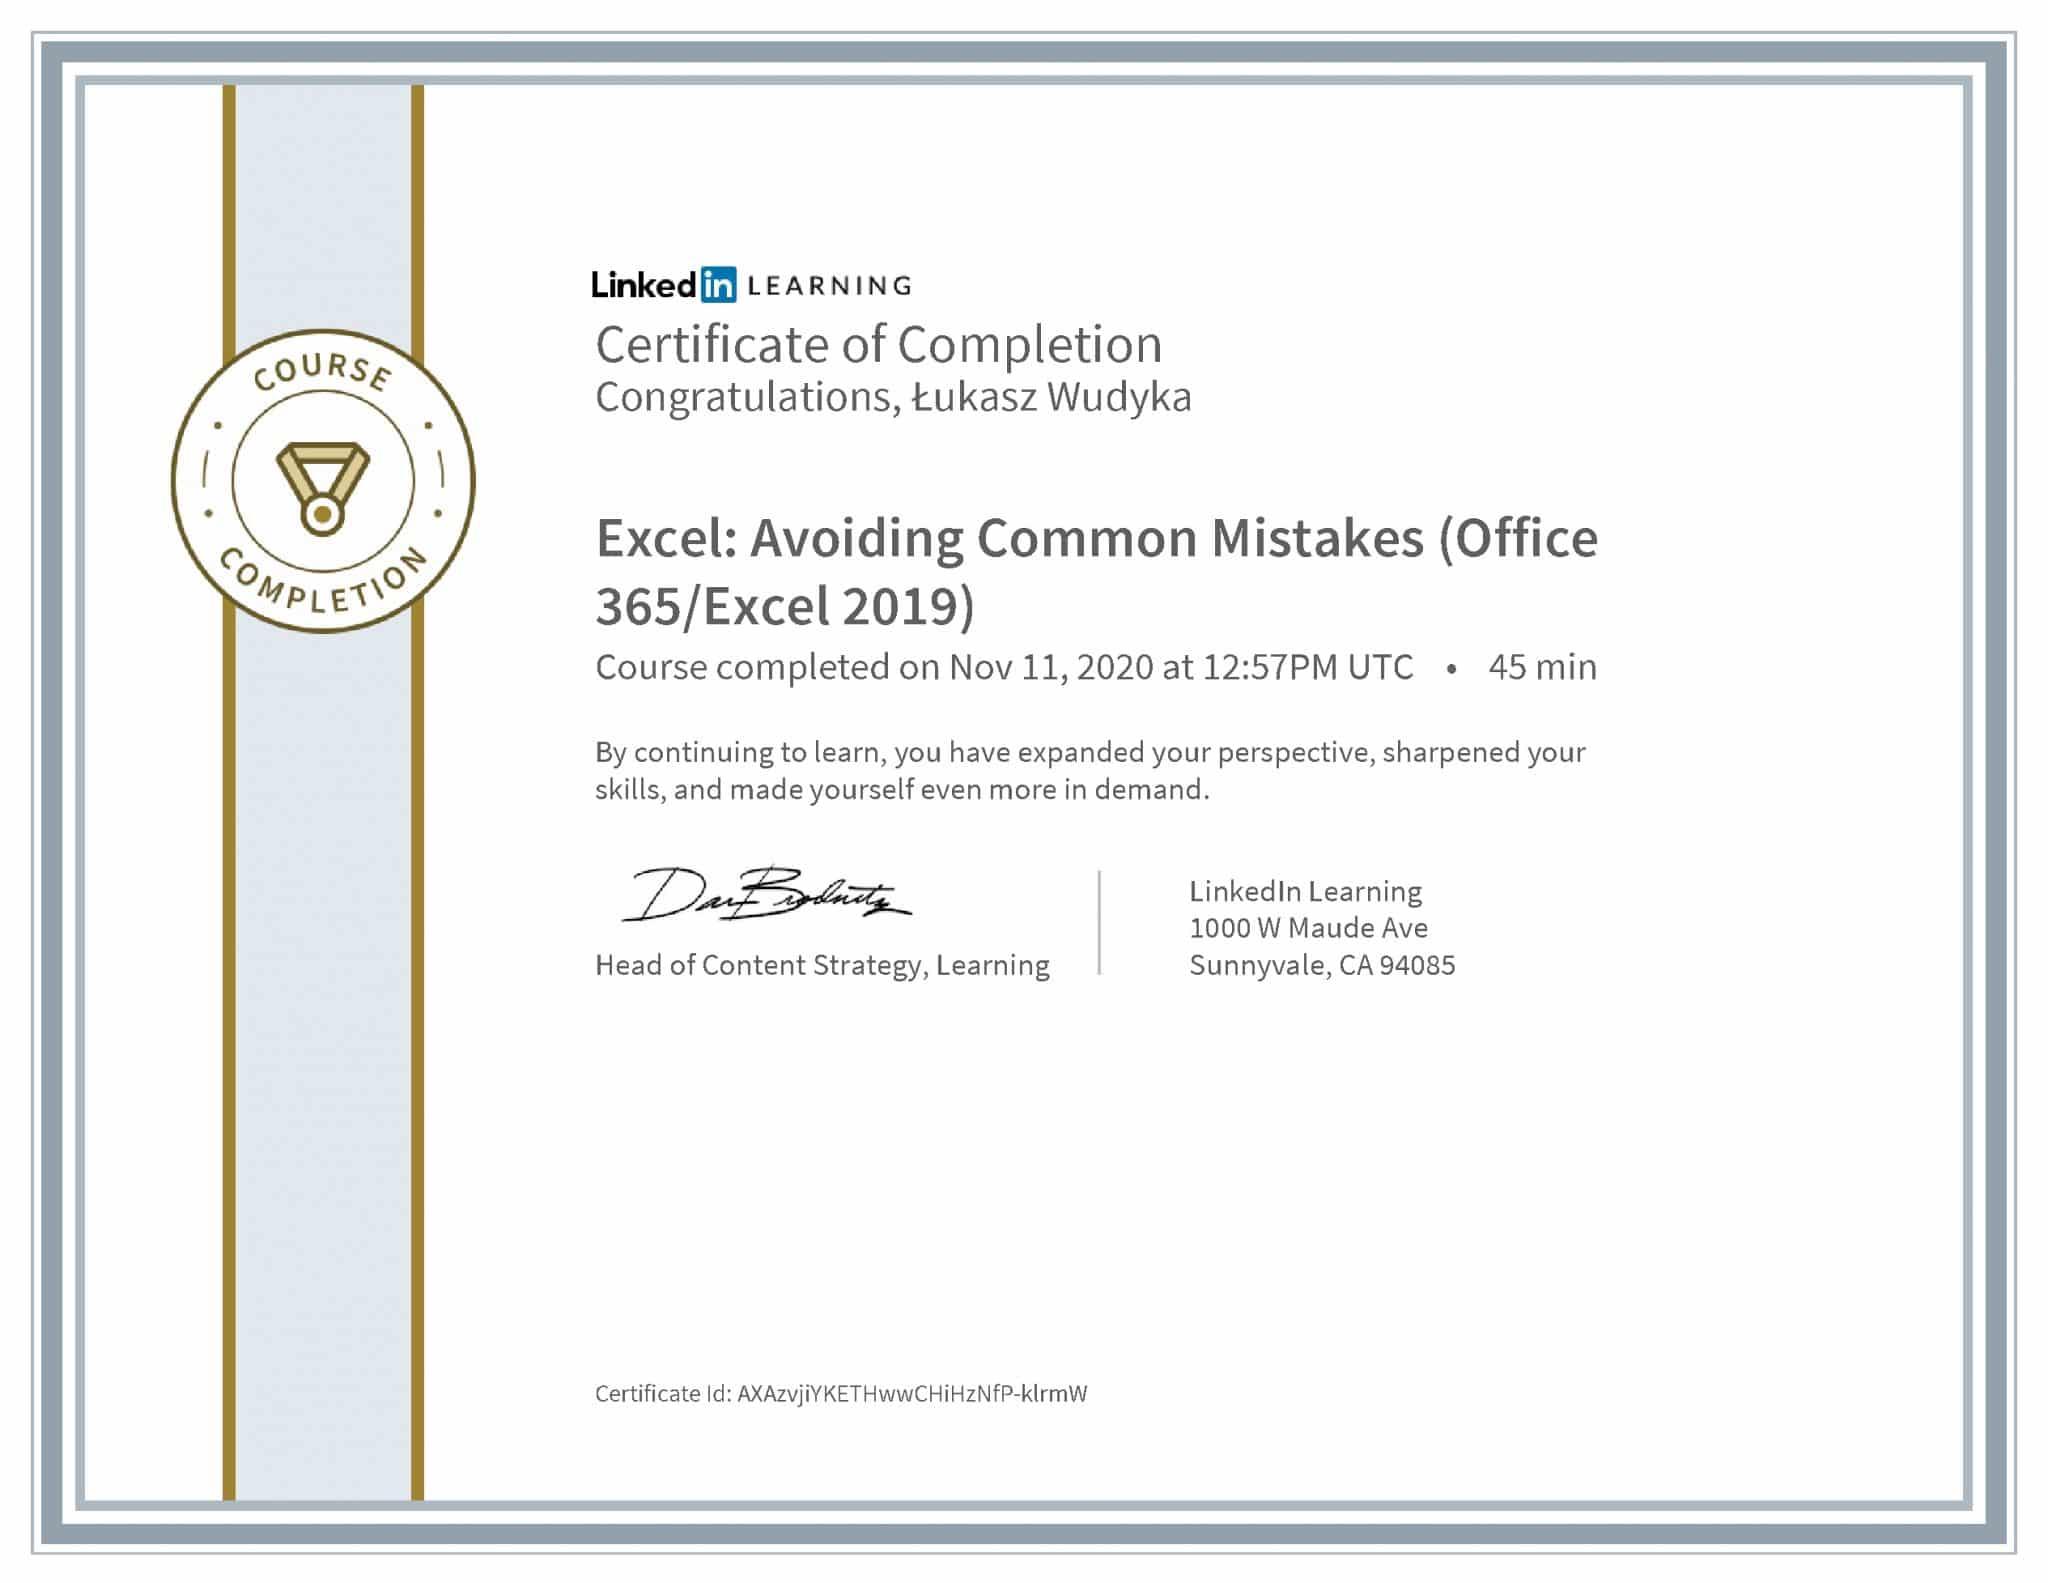 Łukasz Wudyka certyfikat LinkedIn Excel: Avoiding Common Mistakes (Office 365/Excel 2019)